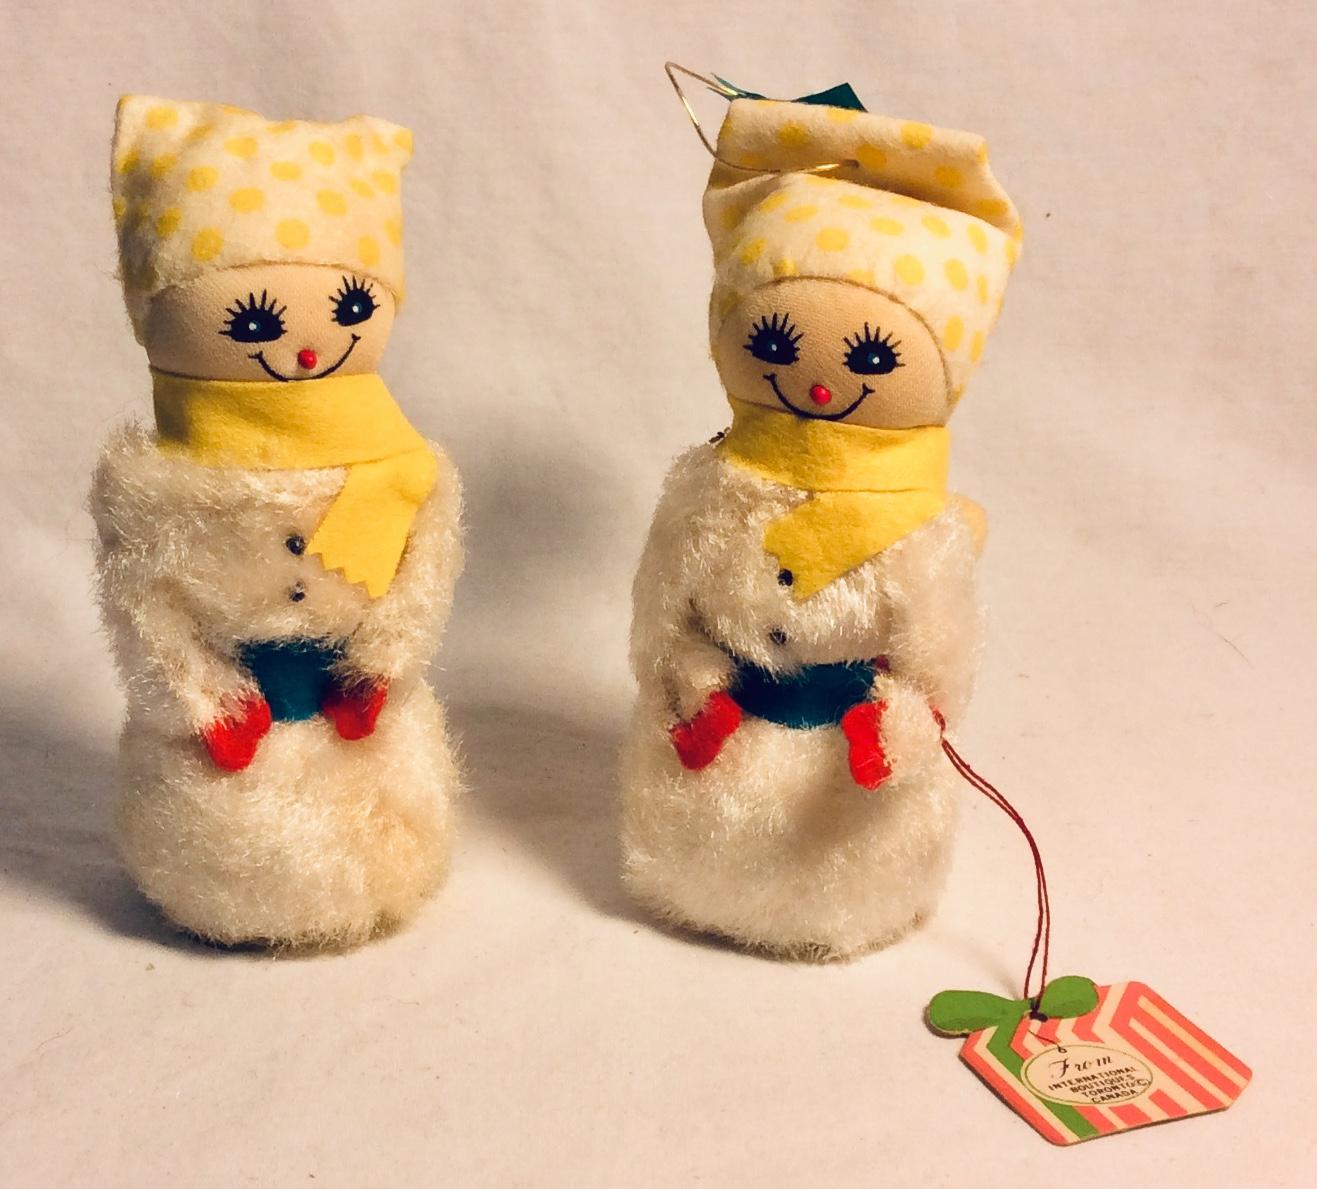 "5"" tall vintage lightweight foam core figurines"